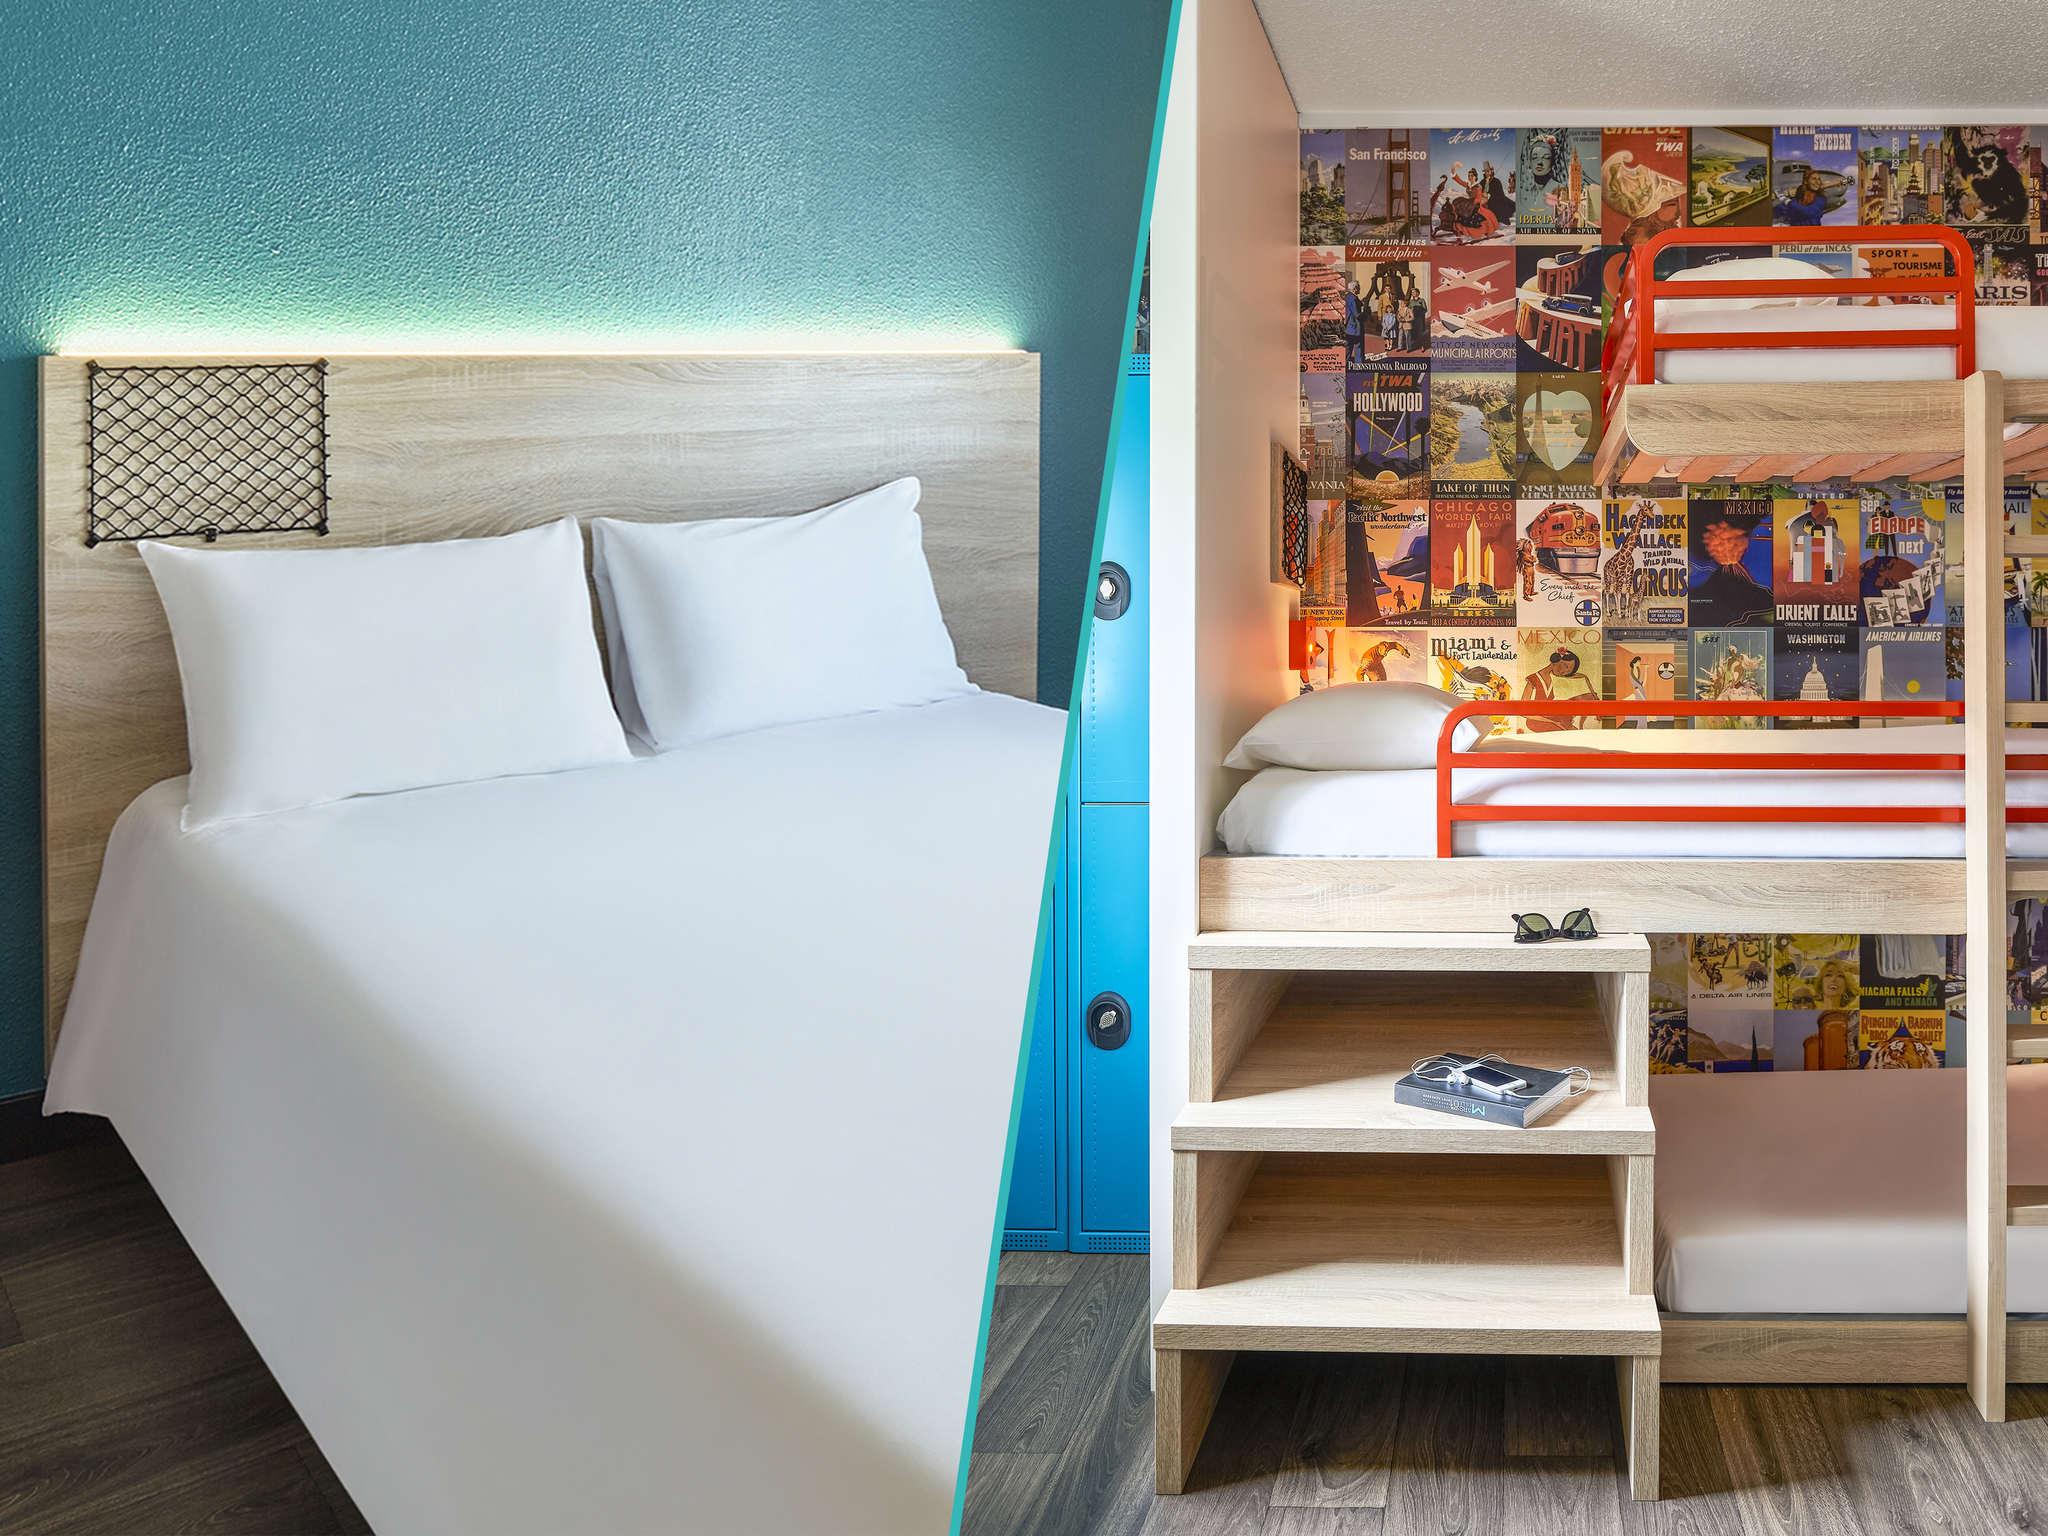 Hotel – hotelF1 Parigi Porte de Châtillon